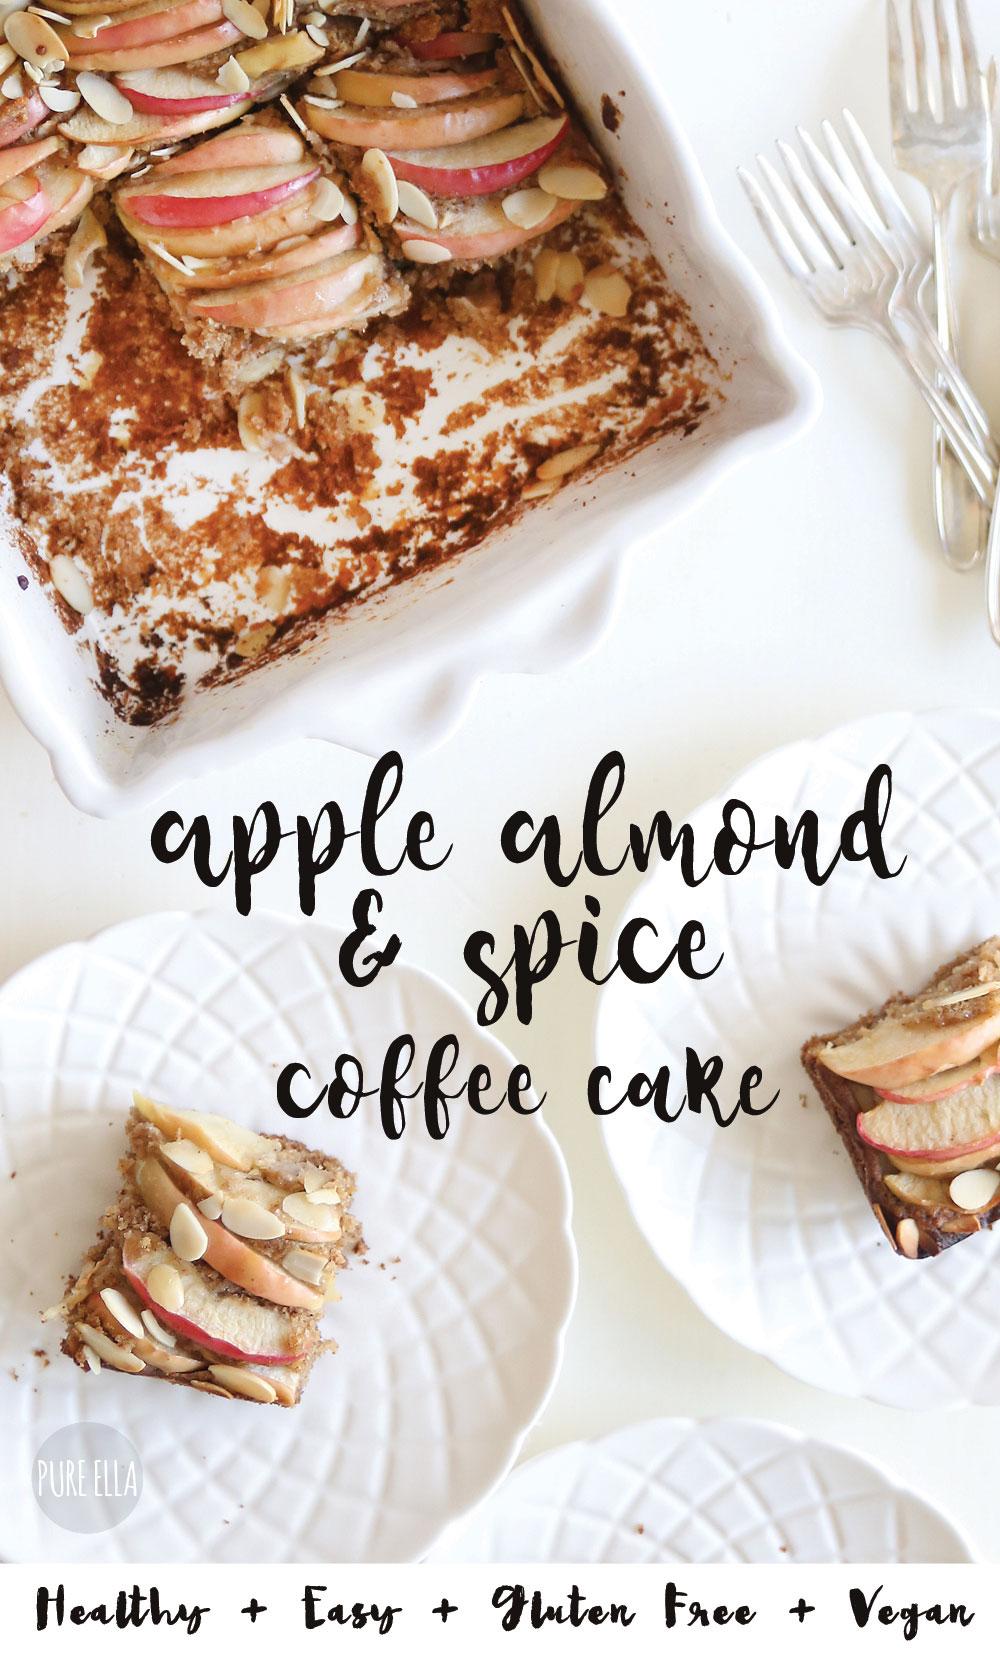 Apple Almond Spice Vegan Coffee Cake Pure Ella